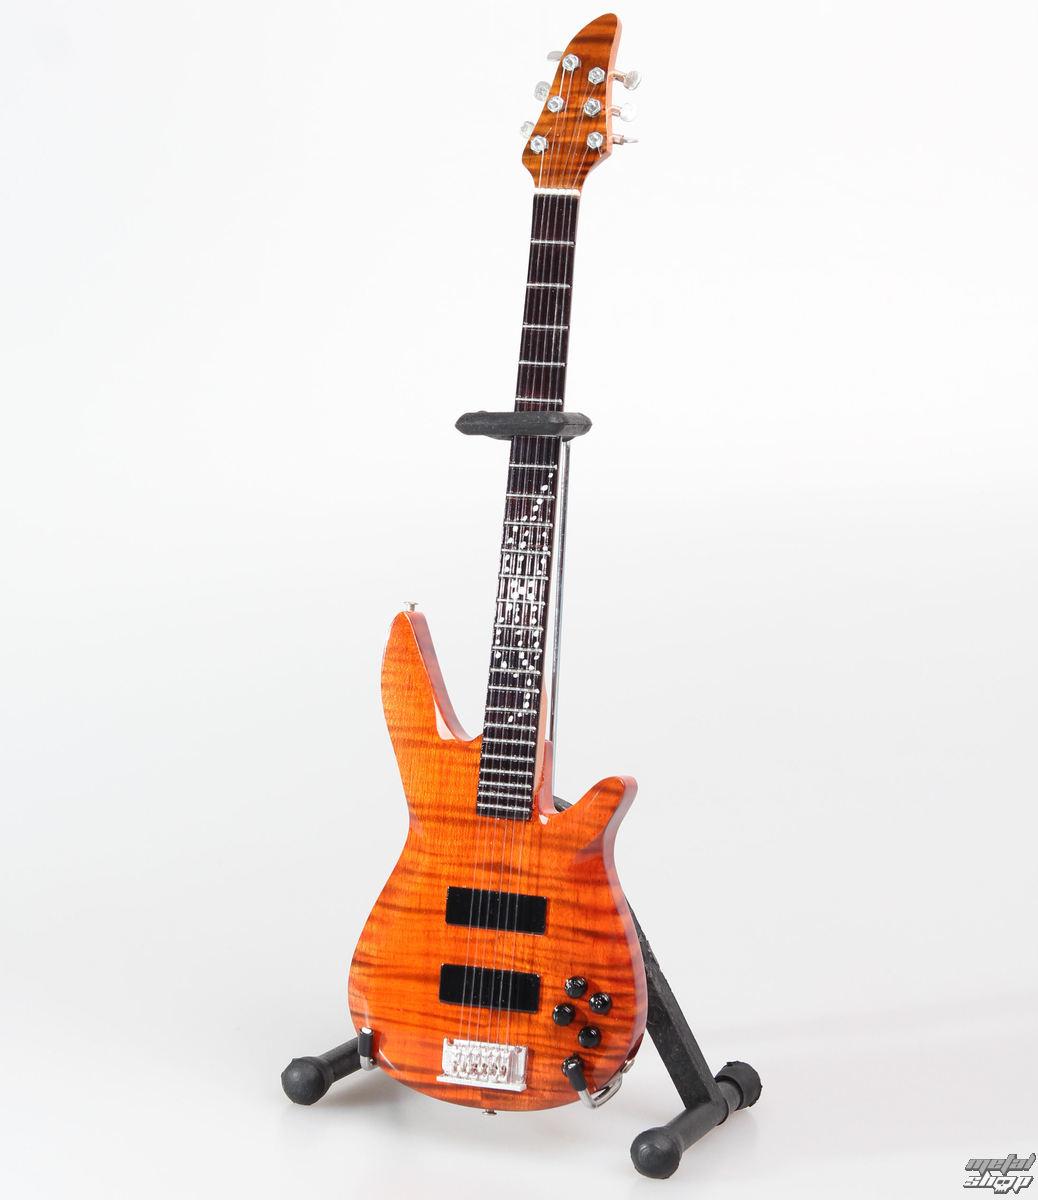 gitara Dream Theater - John Myung - Ruby Red - MINI GUITAR USA - JMY Red